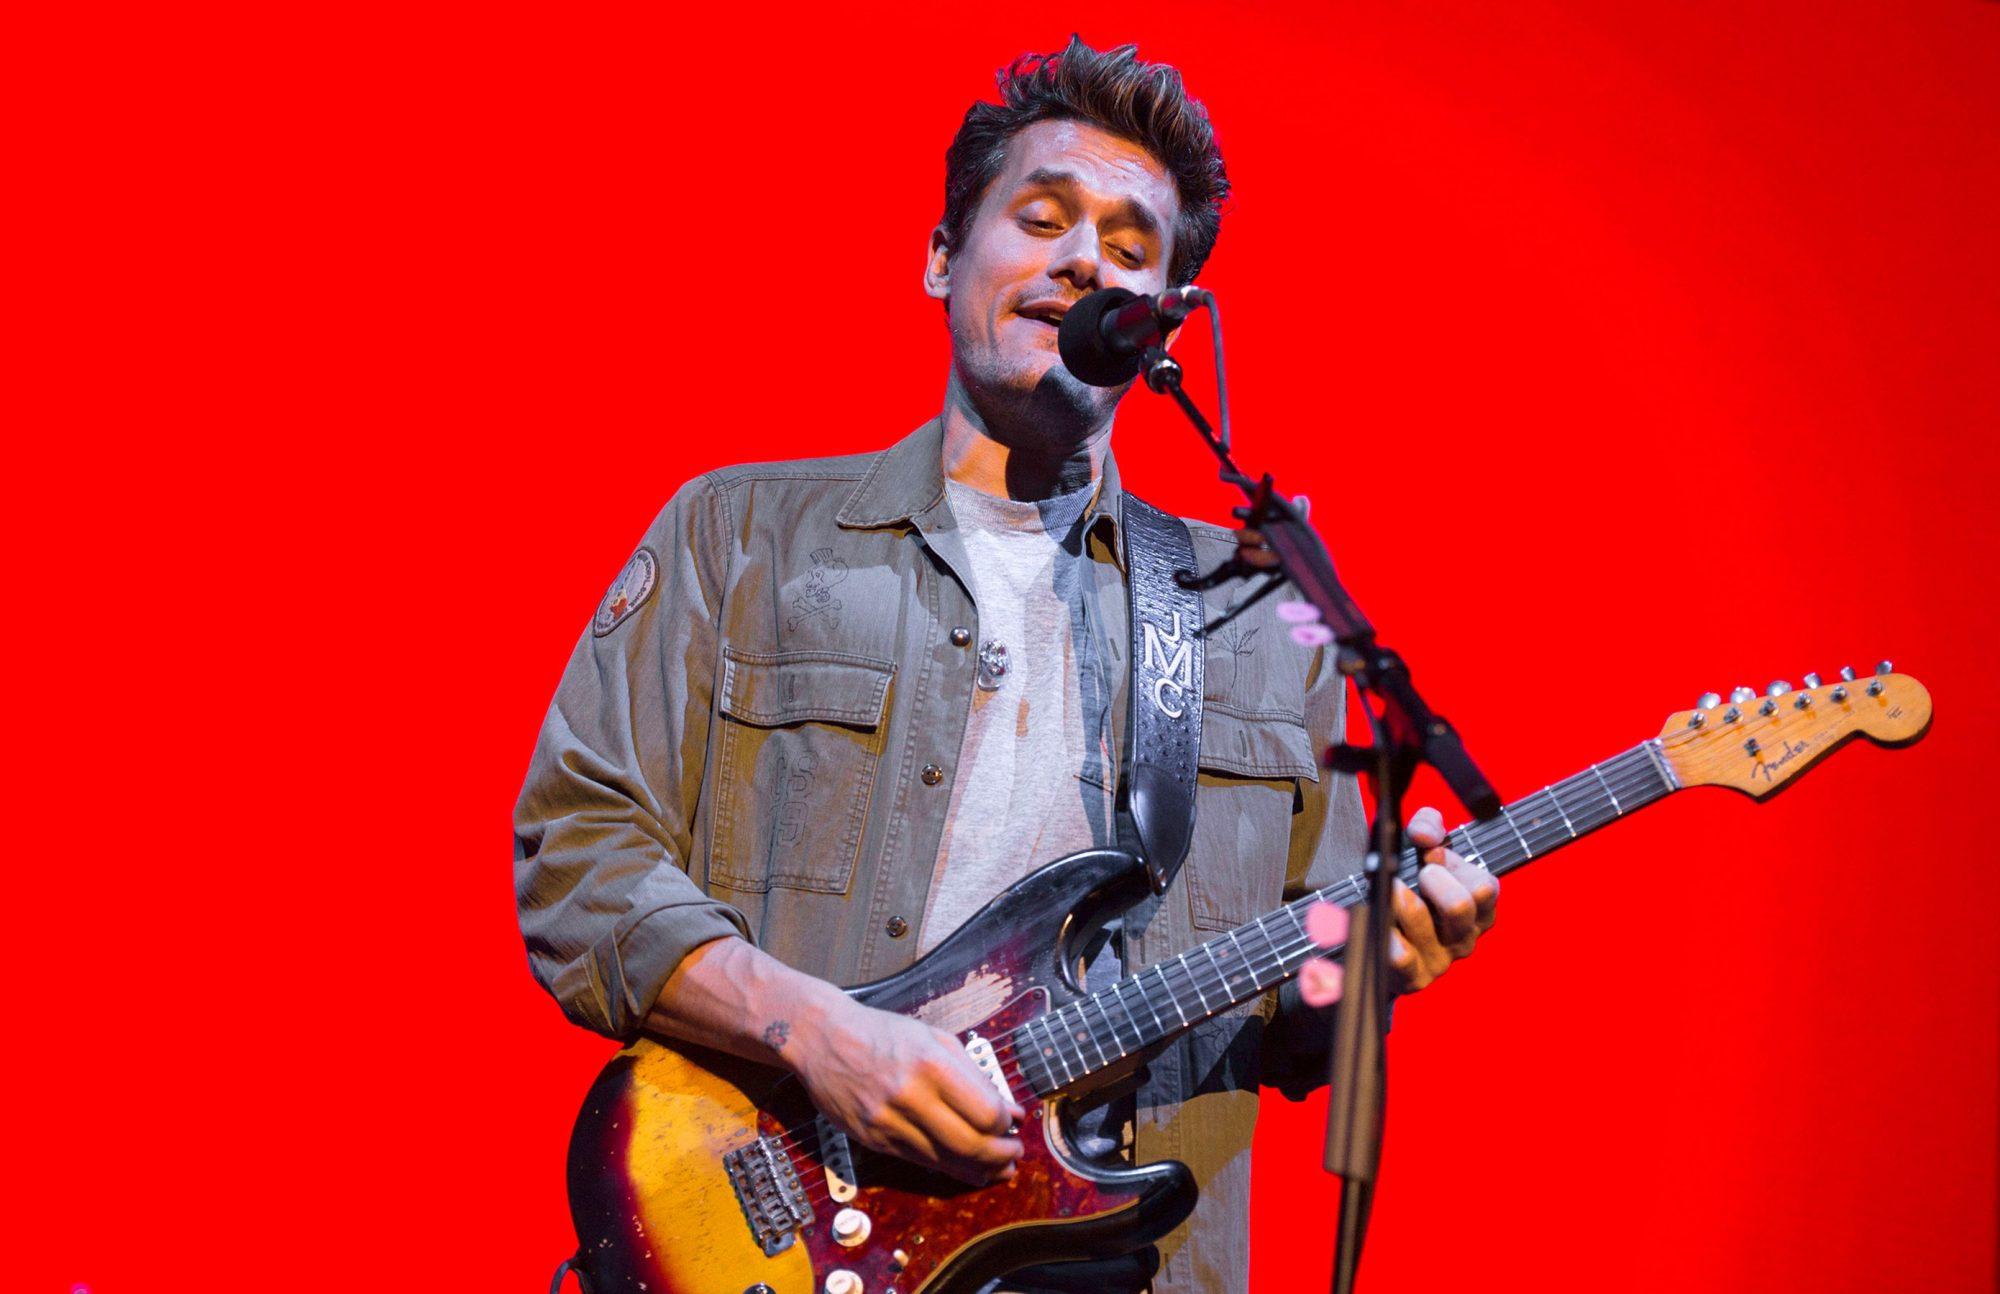 John Mayer in Concert - , NY, Wantagh, USA - 23 Aug 2017